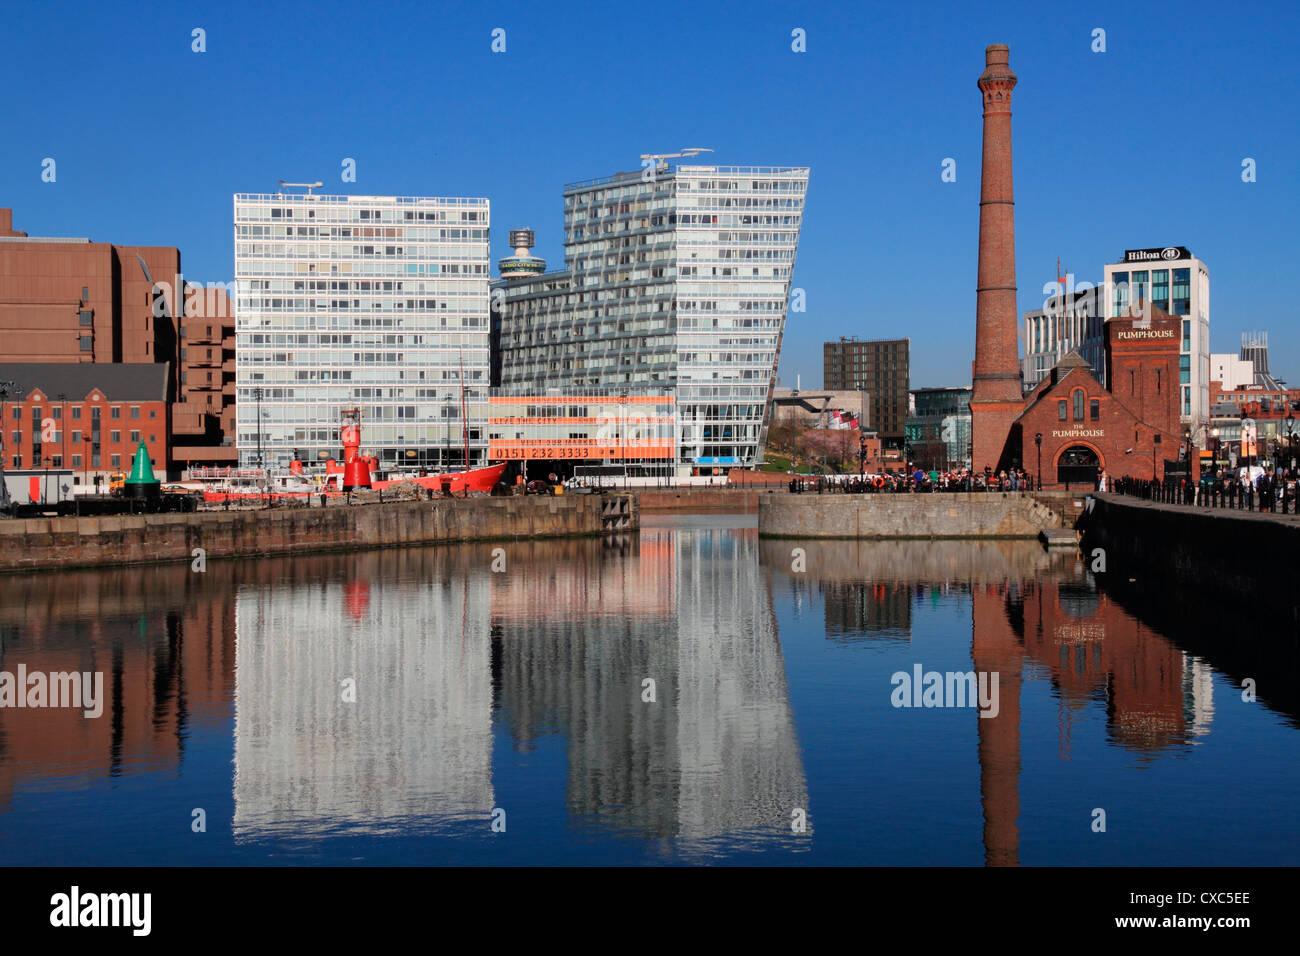 Canning Dock, Liverpool, Merseyside, England, United Kingdom, Europe - Stock Image